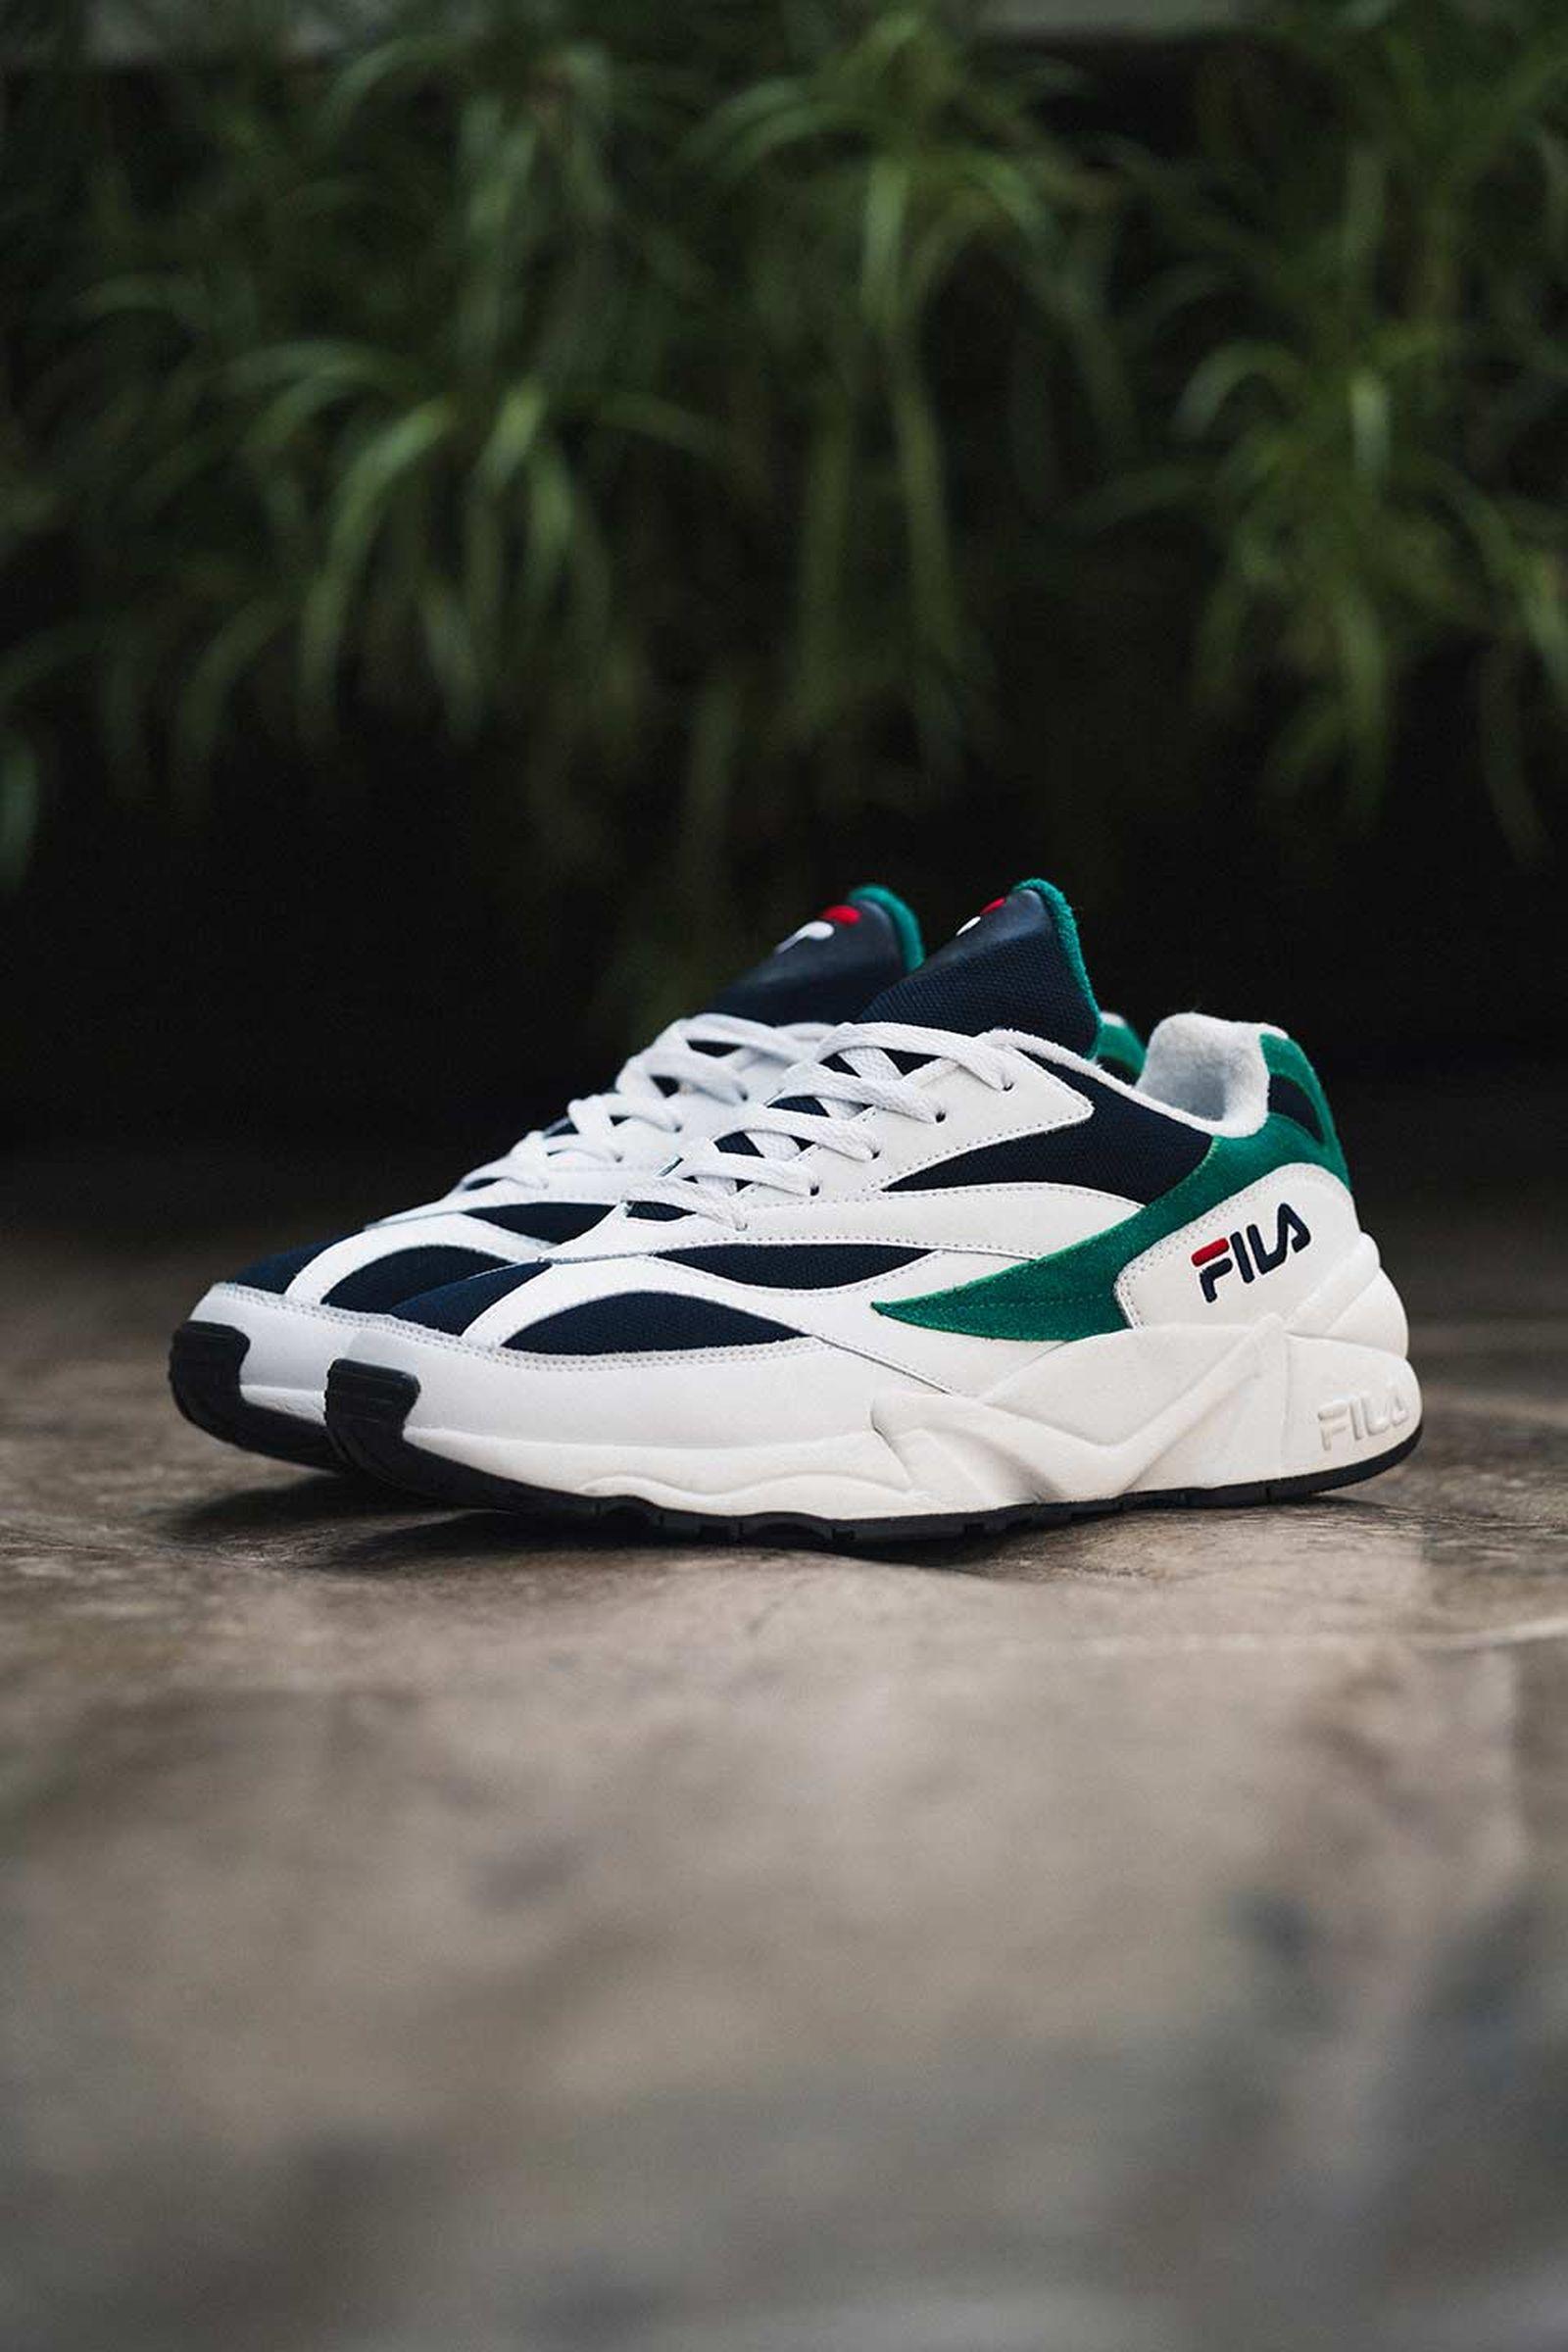 fila-venom-sneakers-release-date-price-05